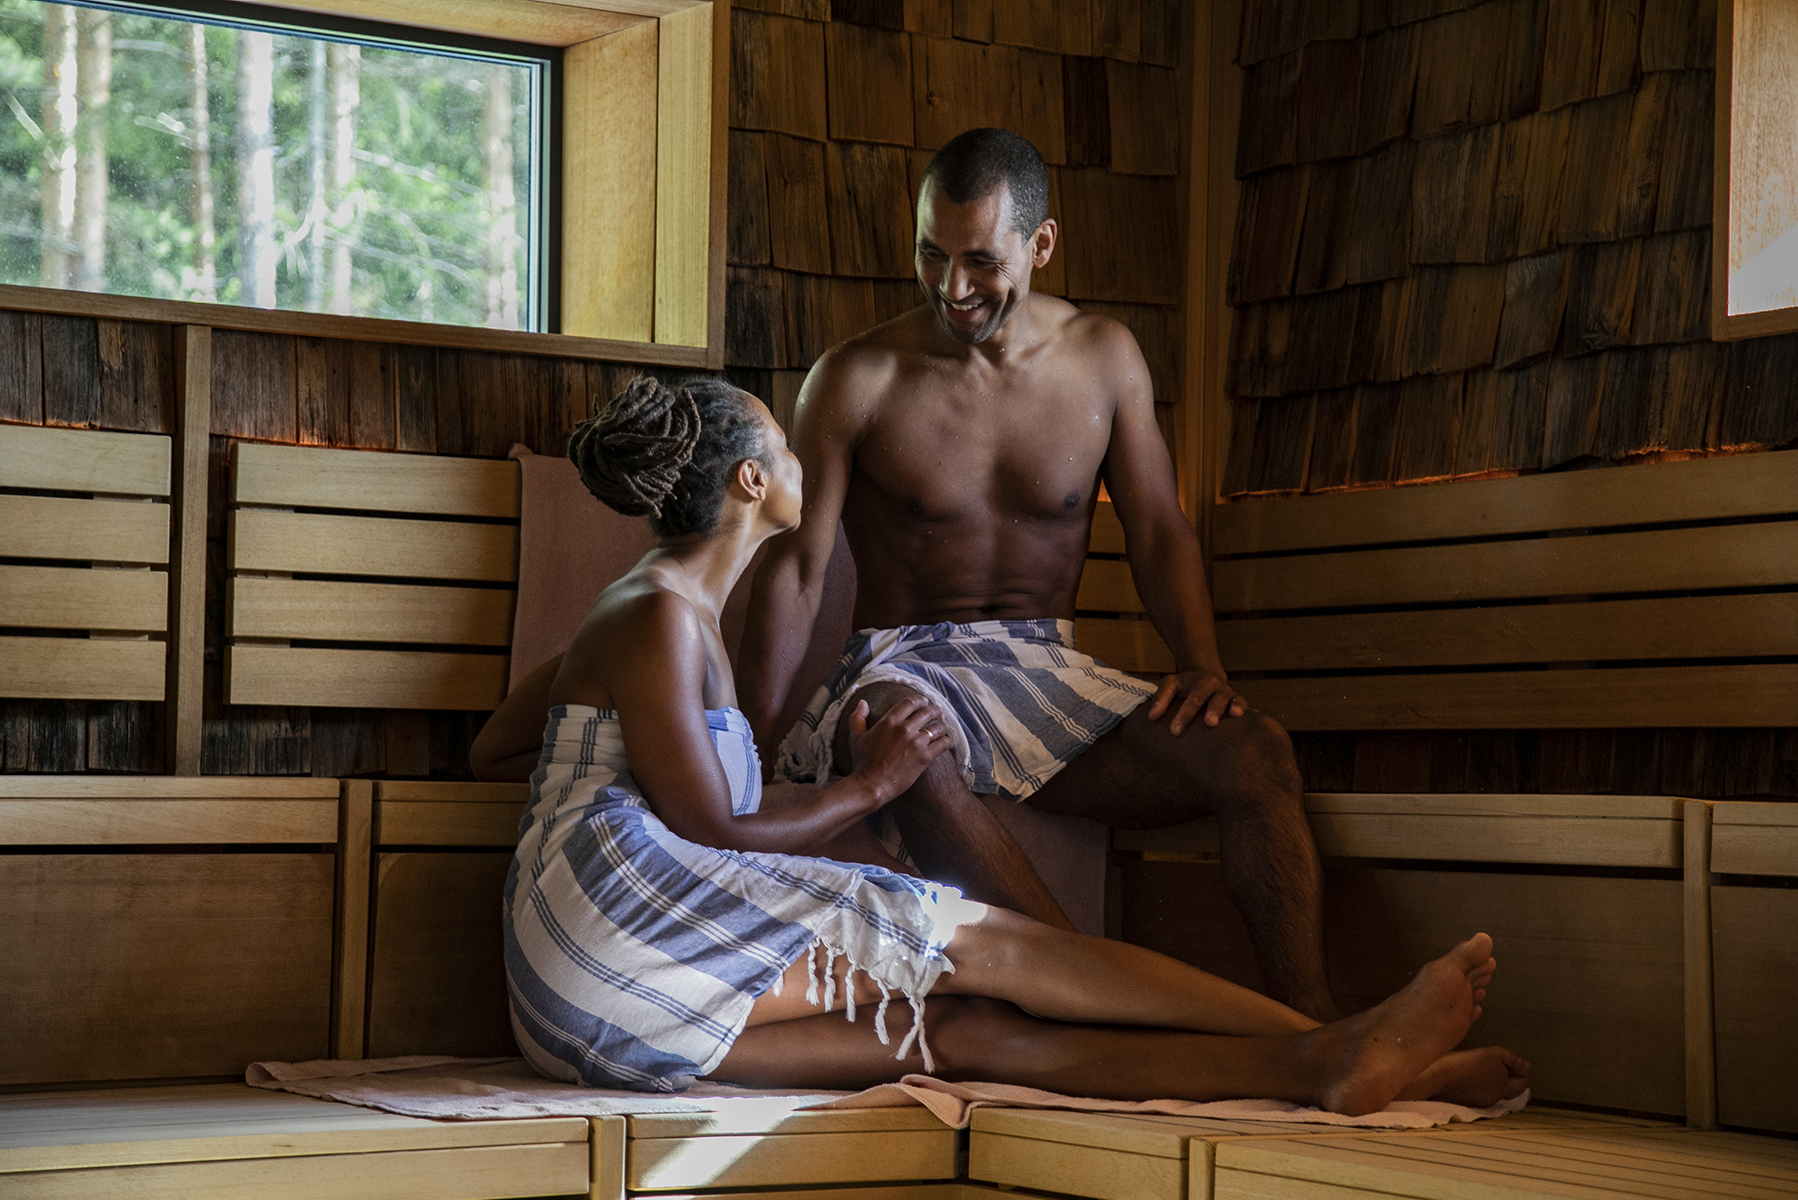 Par i Skogsauna